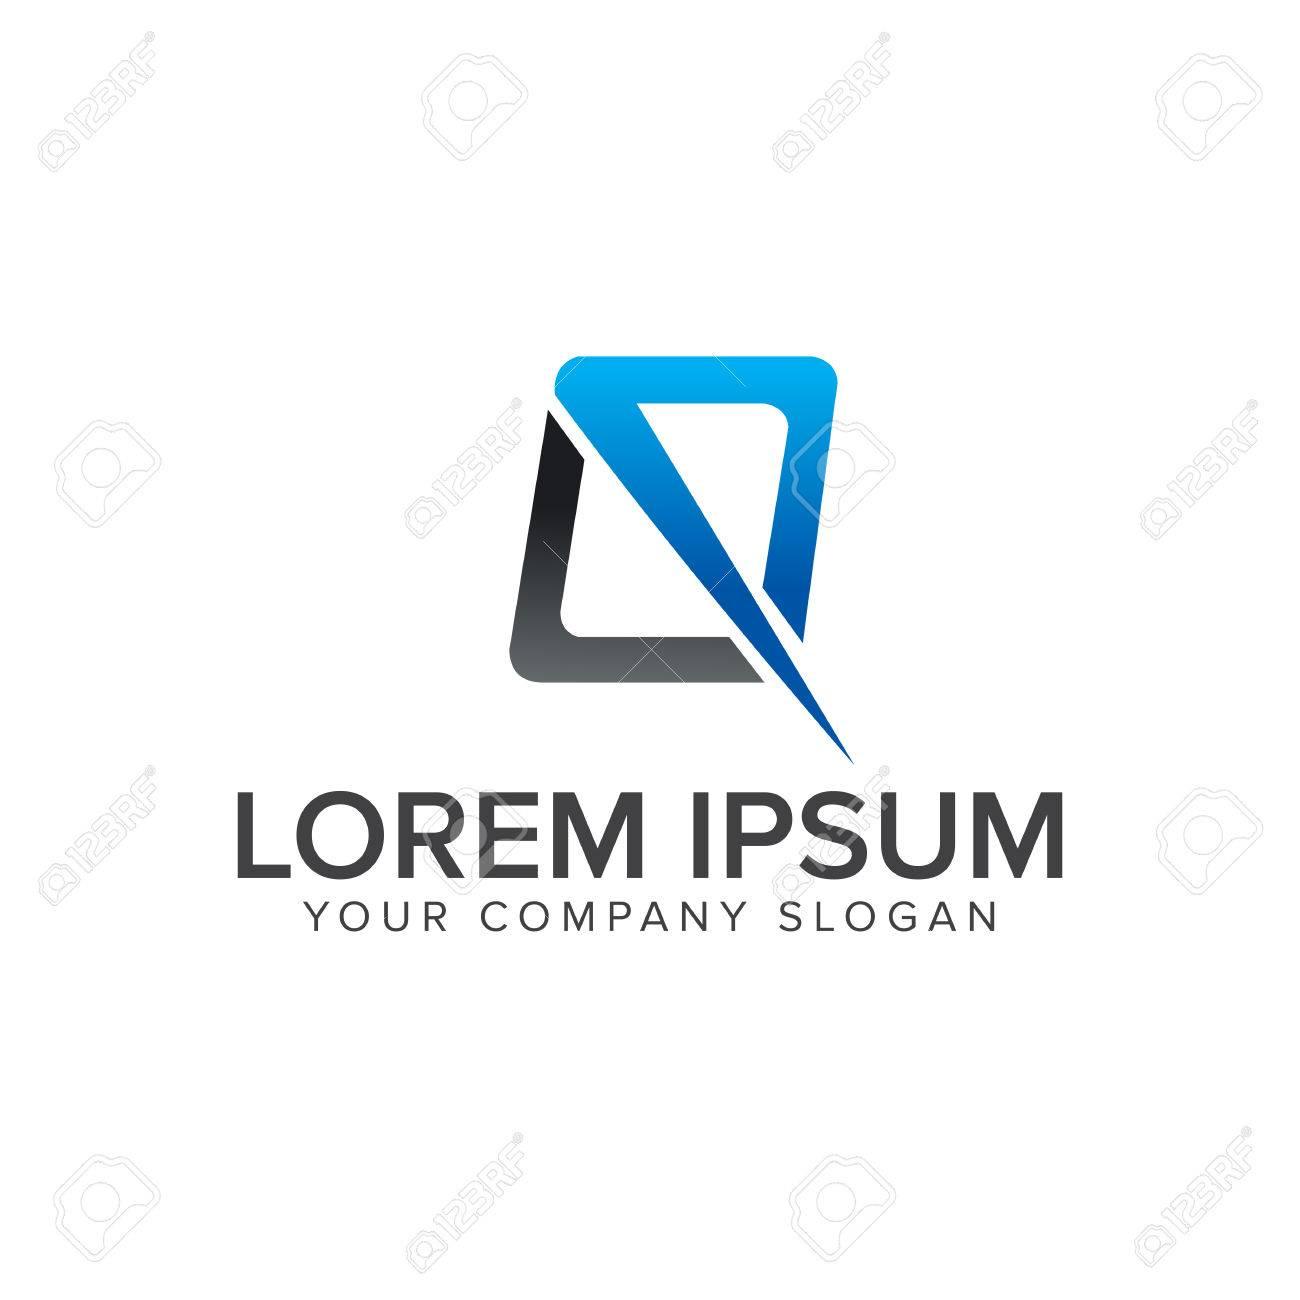 Free Online Logo Design 700 Customisable Logo Designs